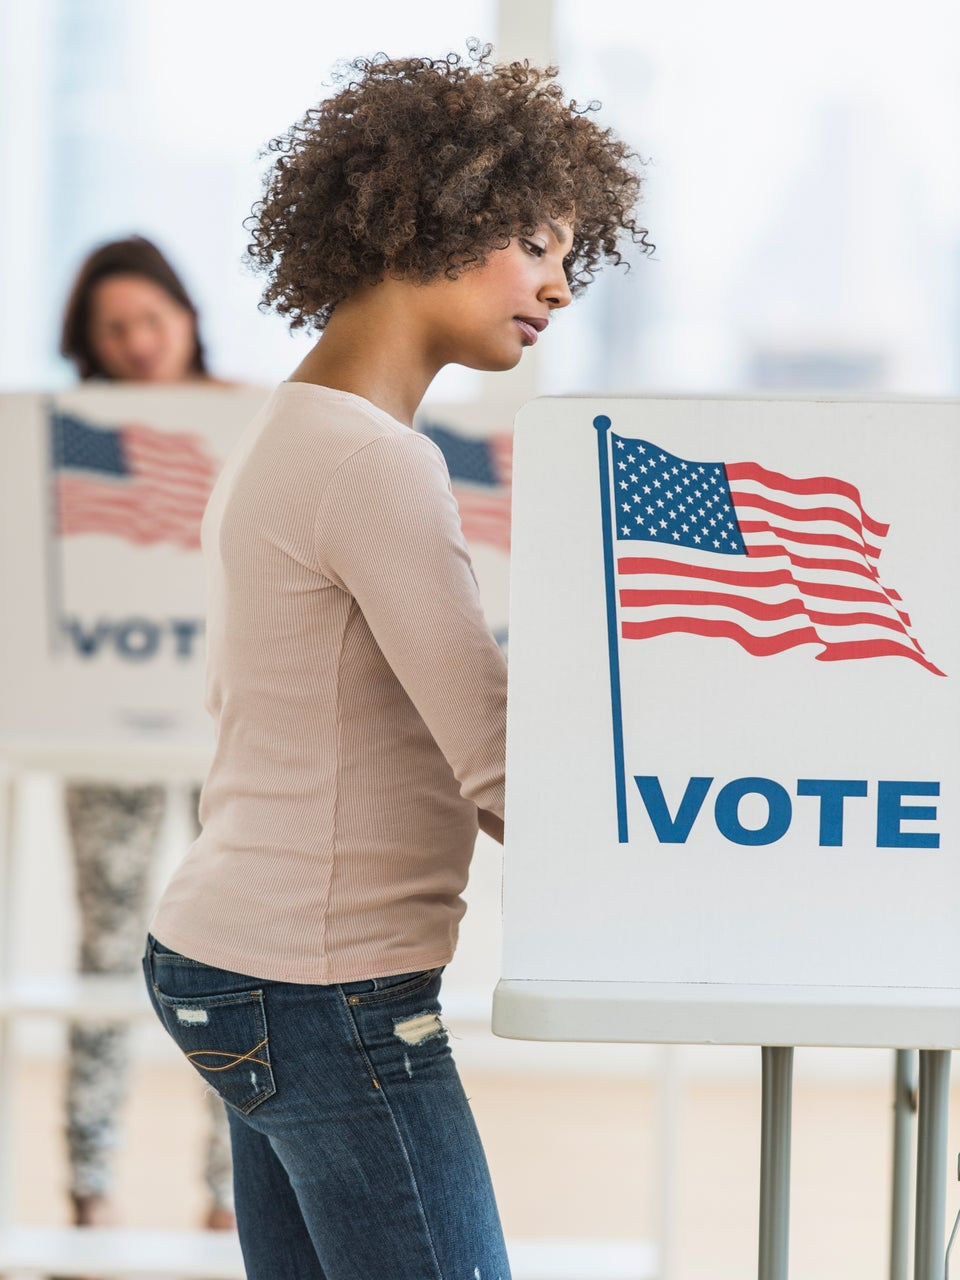 All Young Voters Want Is A Little R-E-S-P-E-C-T